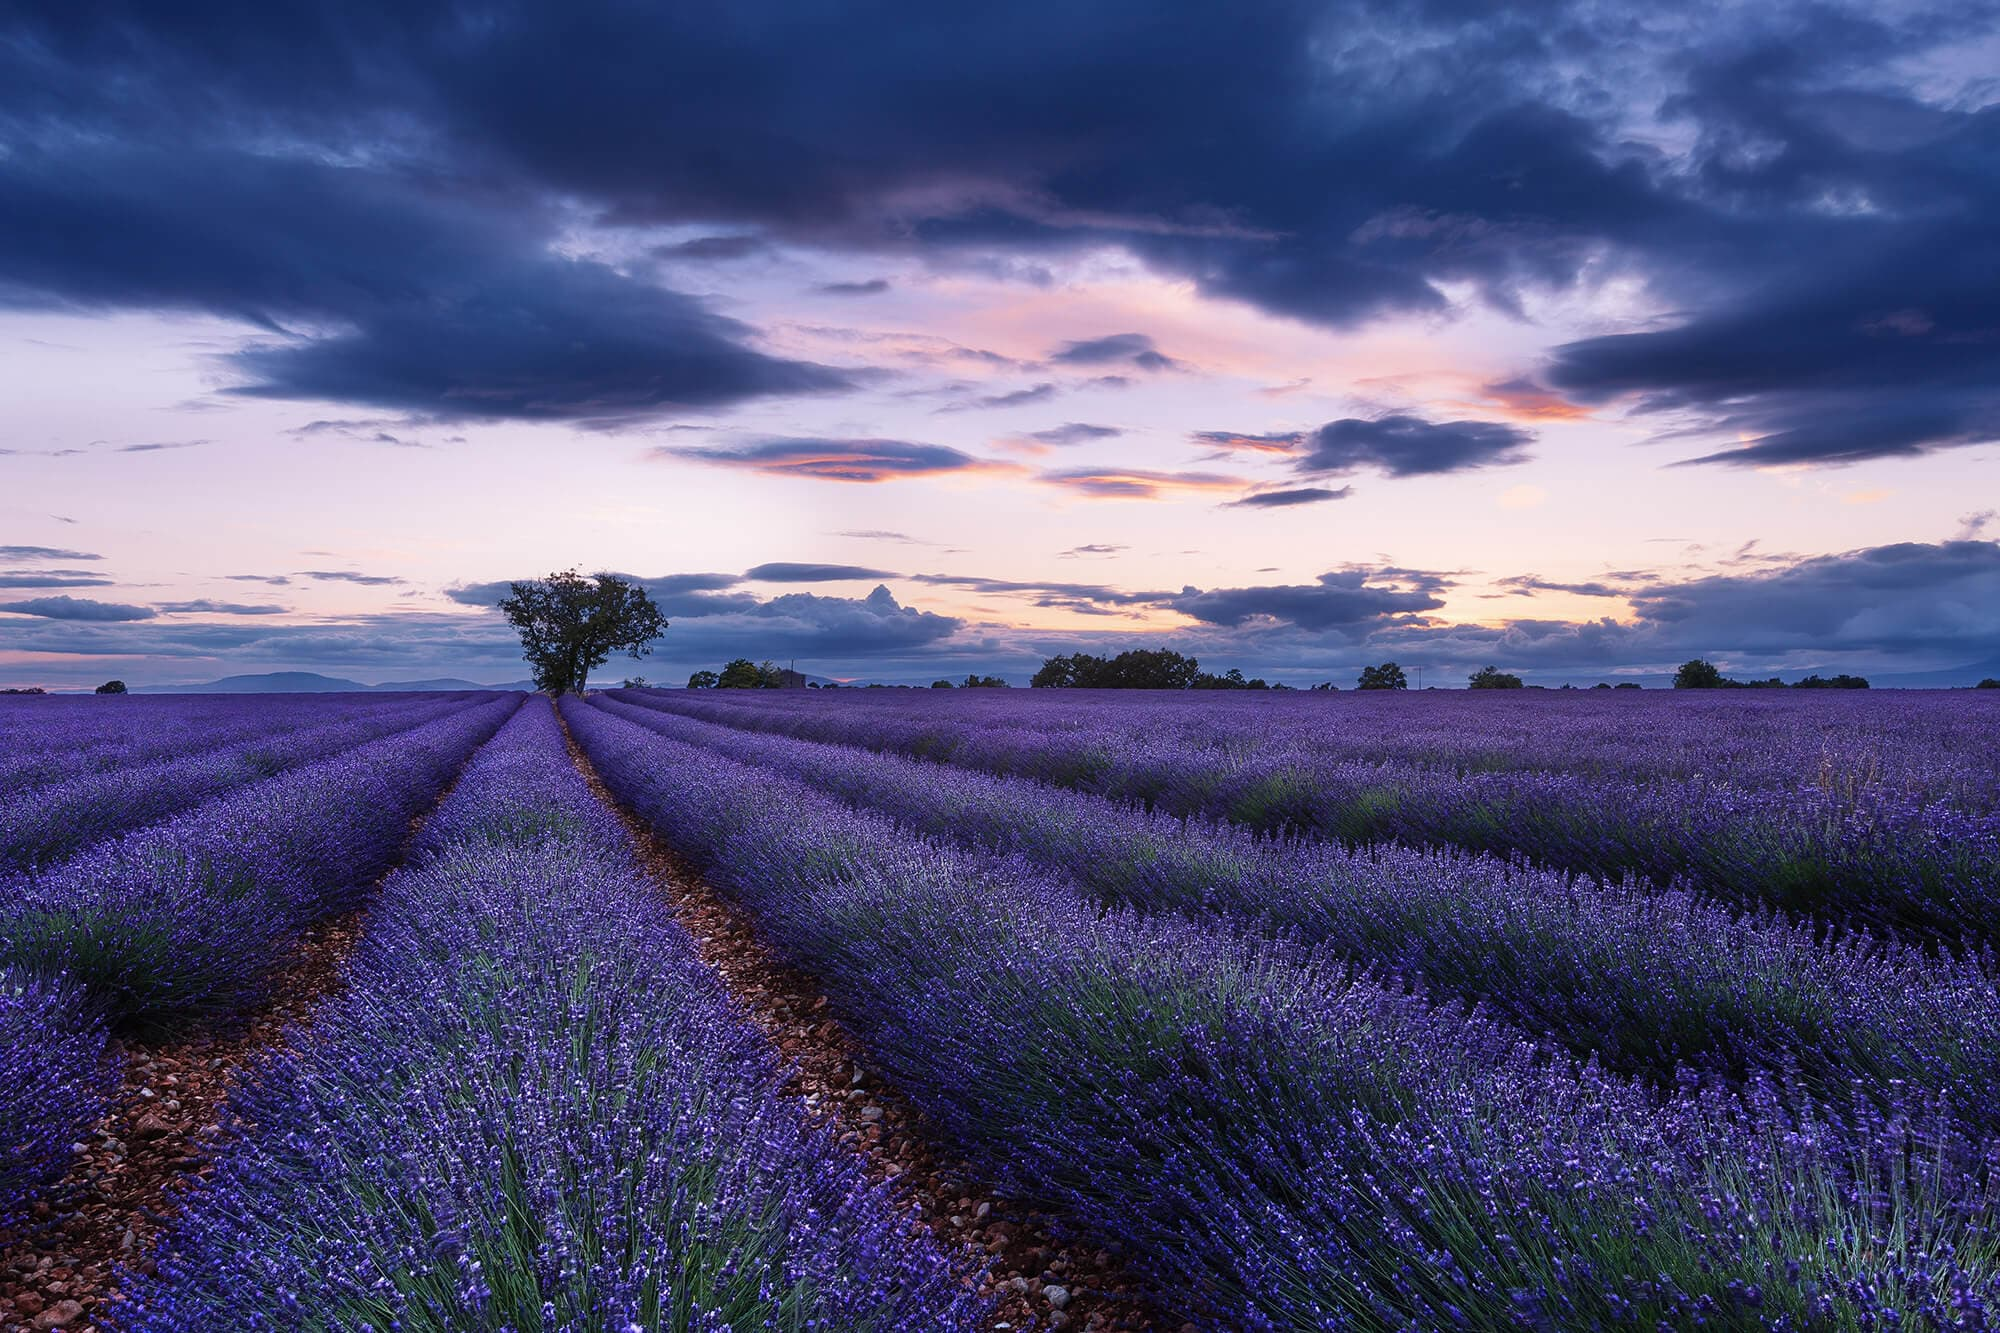 Aurélien Billois Lavendelfelder Fotografie Design